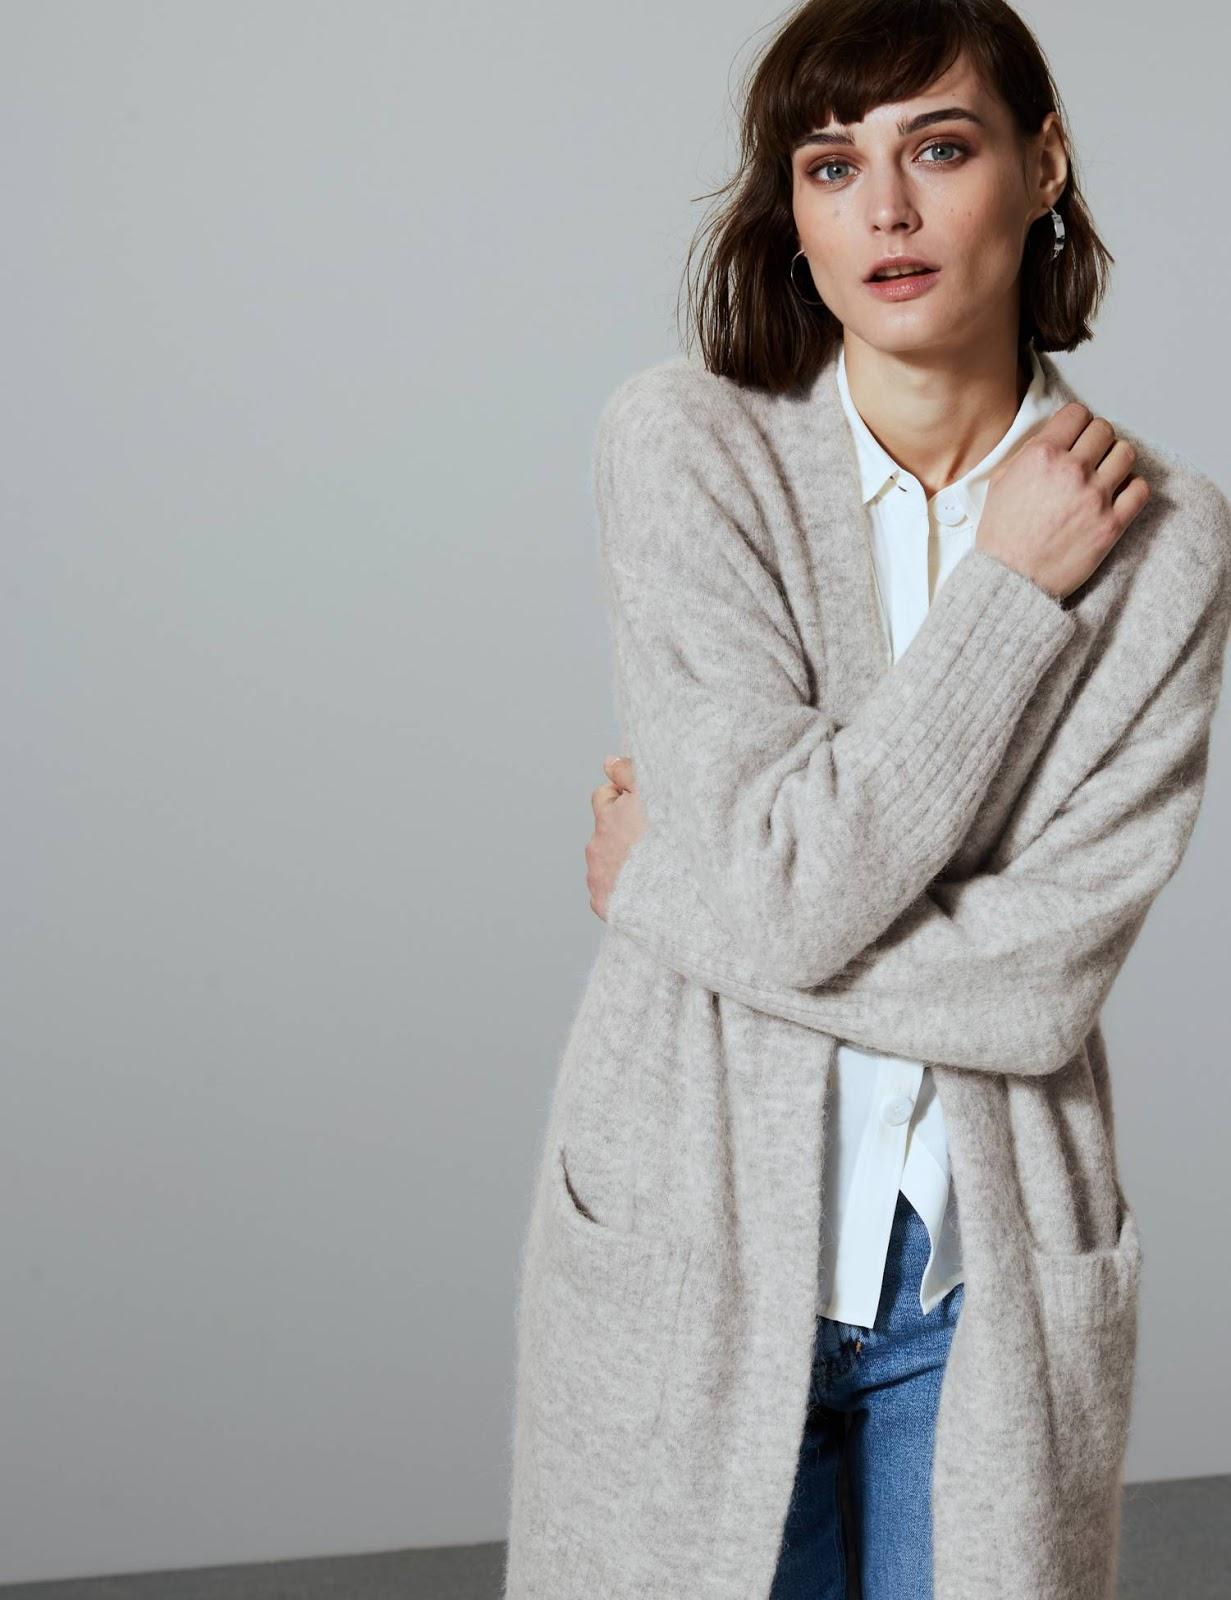 Marks & Spencer Wool Blend Textured Cardigan